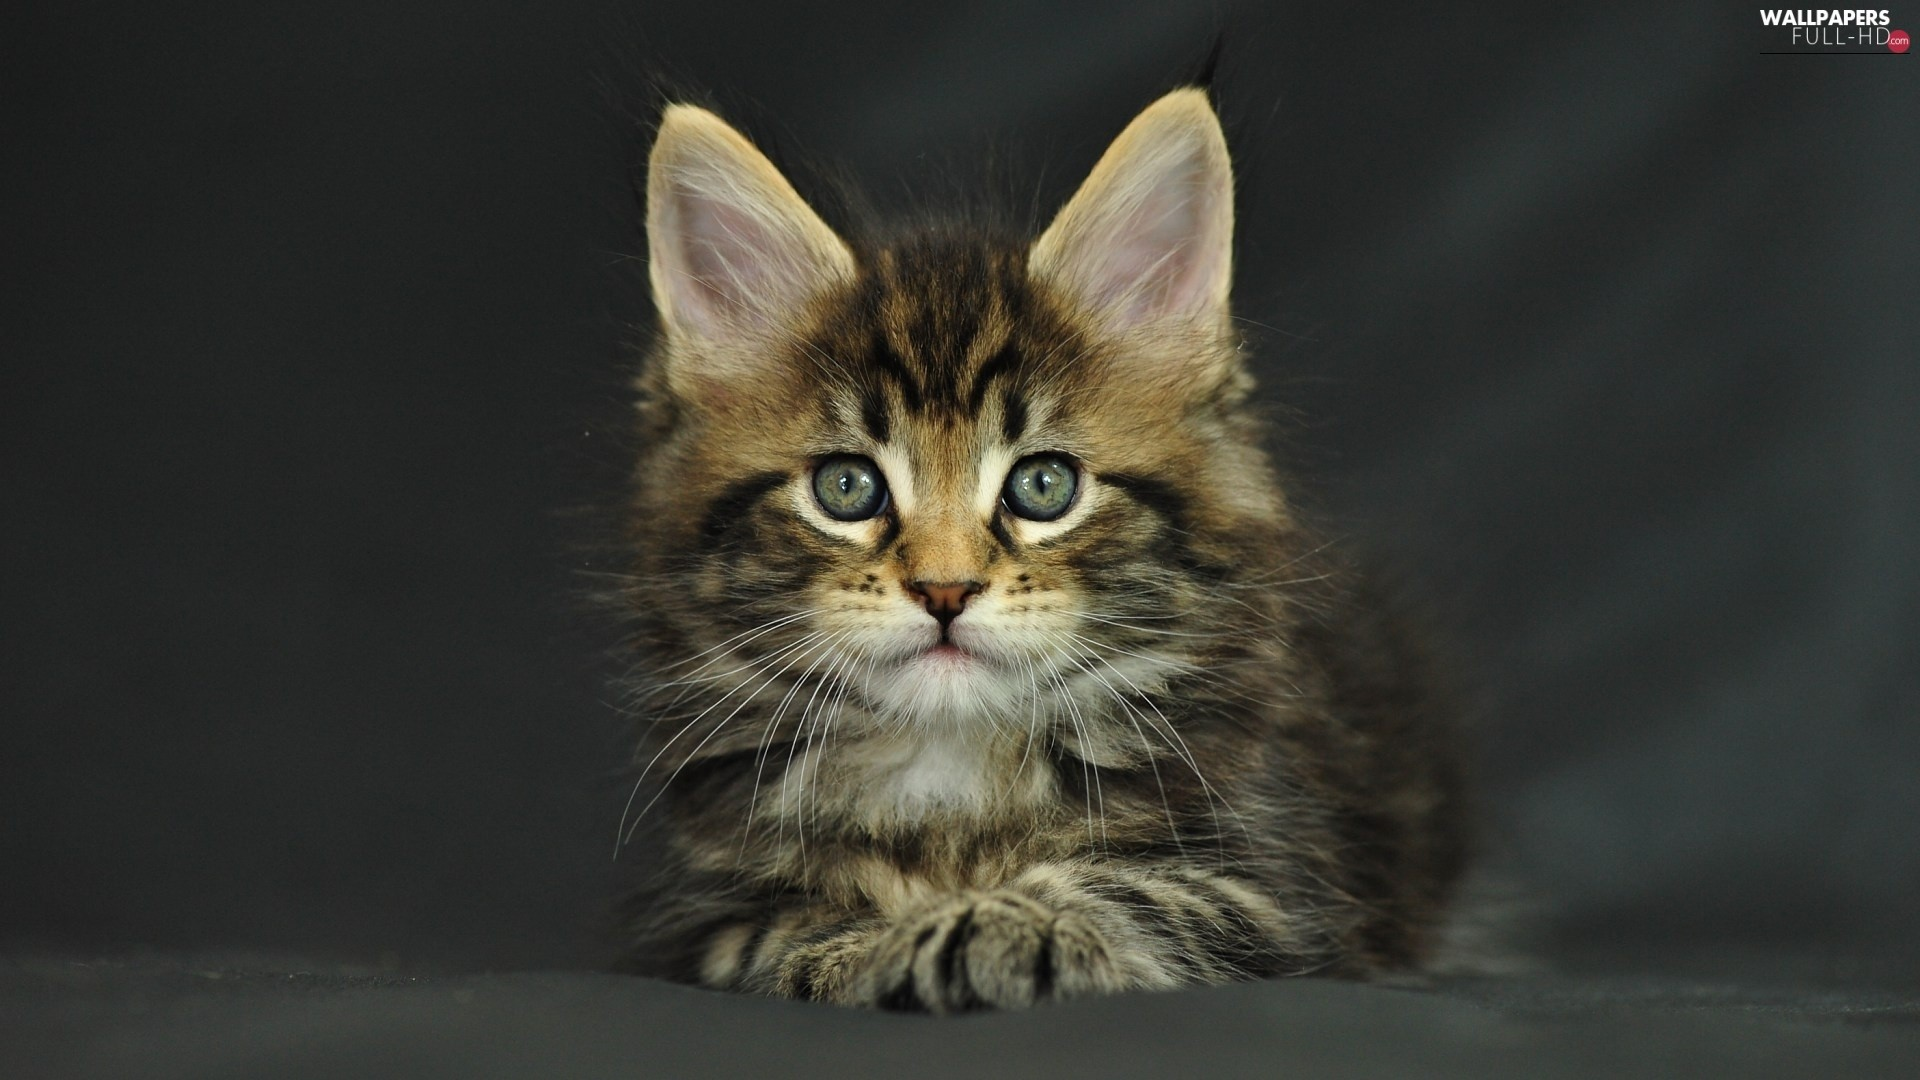 Res: 1920x1080, Maine Coon, kitten